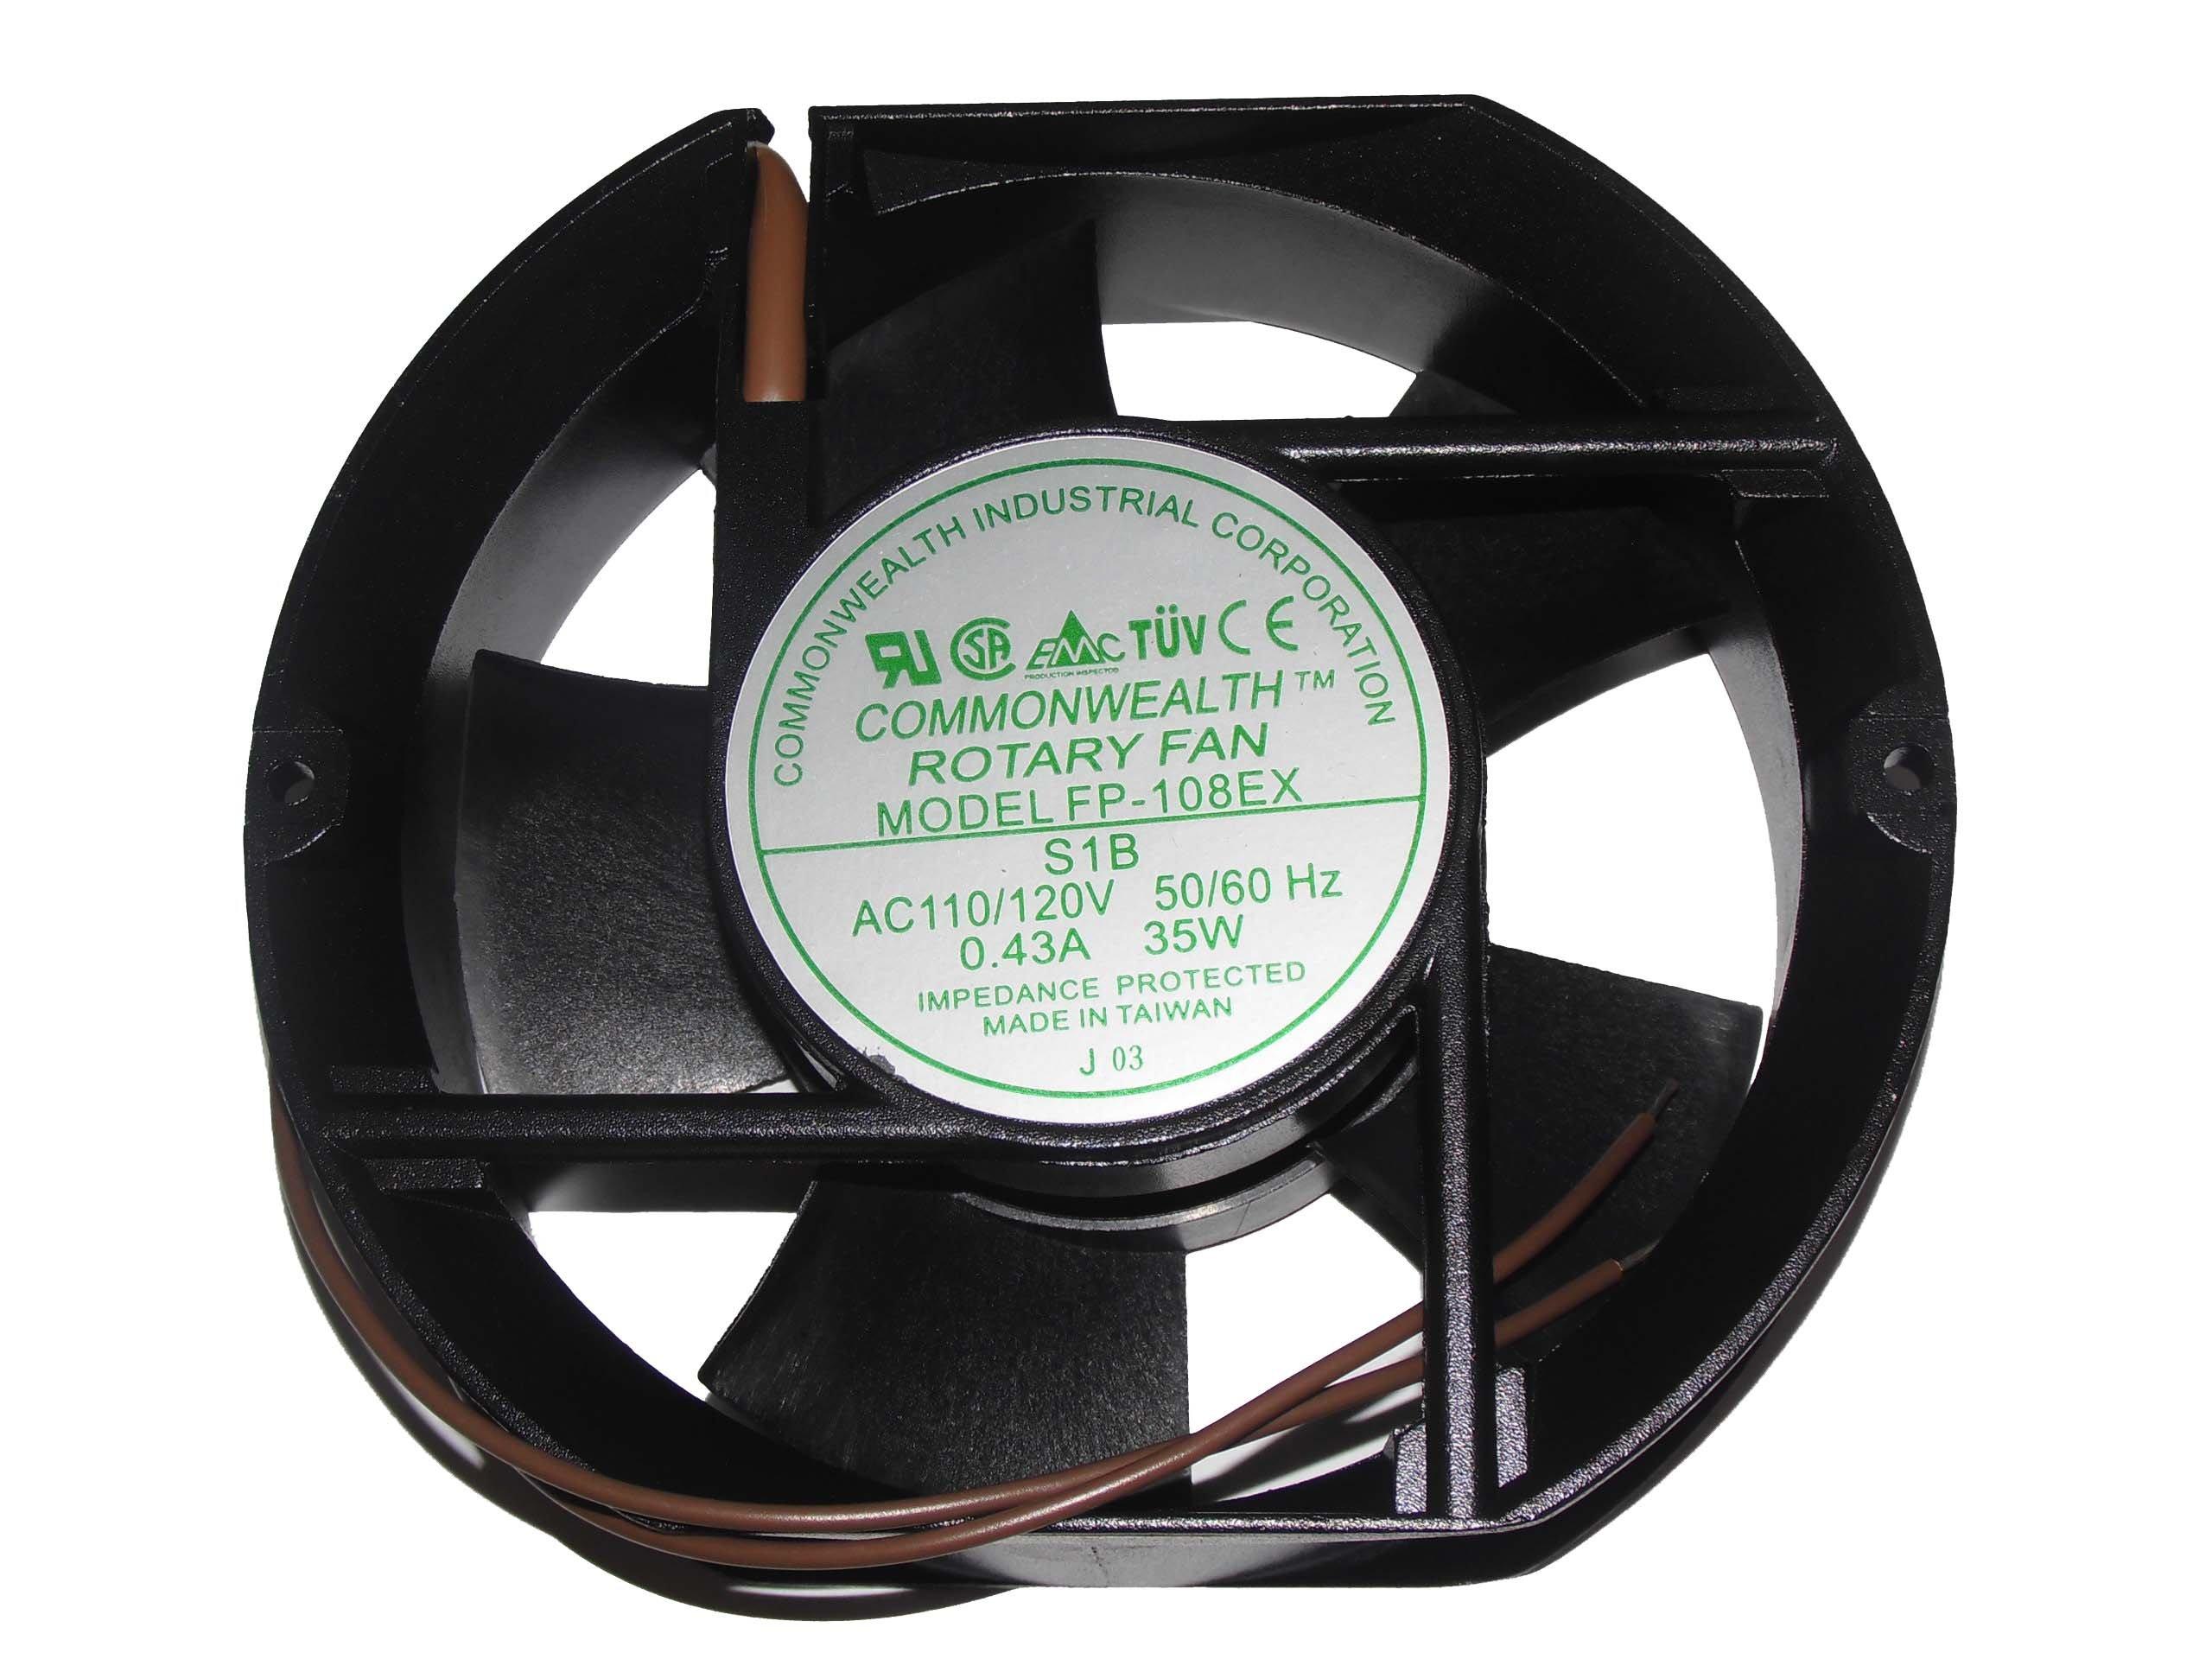 FP-108EX-S1-B 110V 50/60Hz 0.5A 38W AC Fan,FP-108EX S1B Cabinet